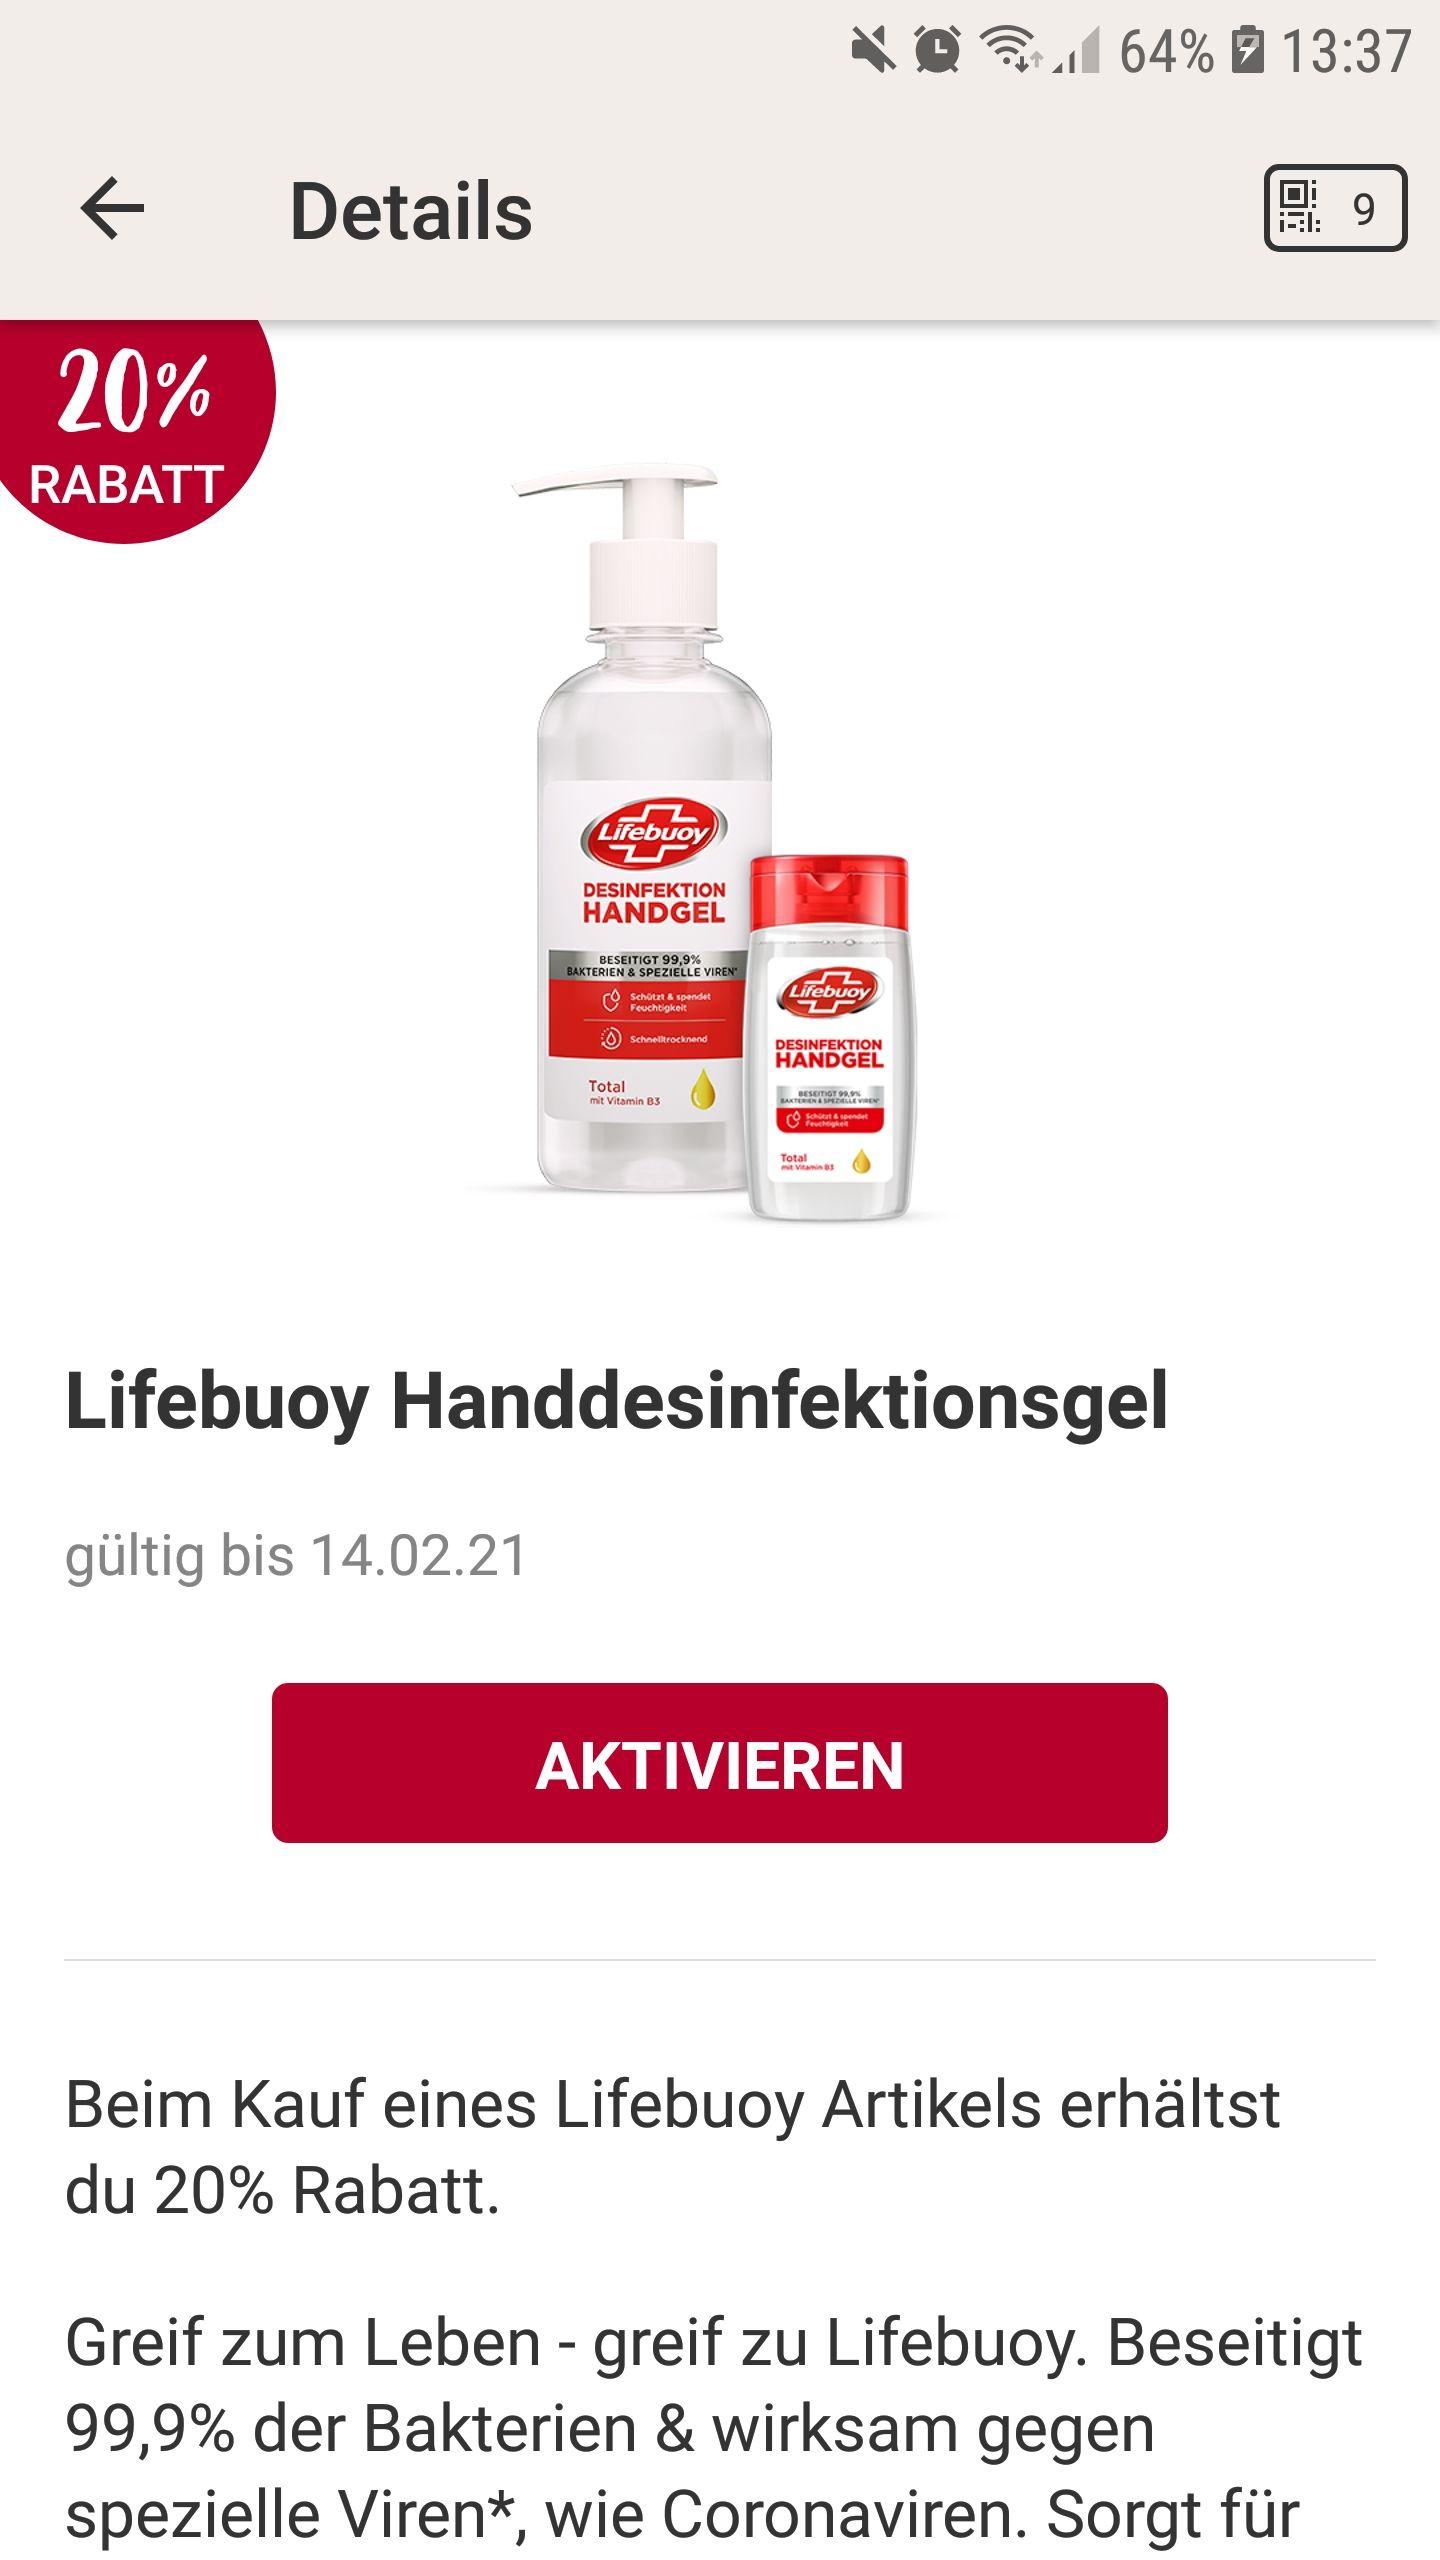 Rossmann Desinfektionsmittel Lifebuoy für 1,51€ durch 20% App Coupon